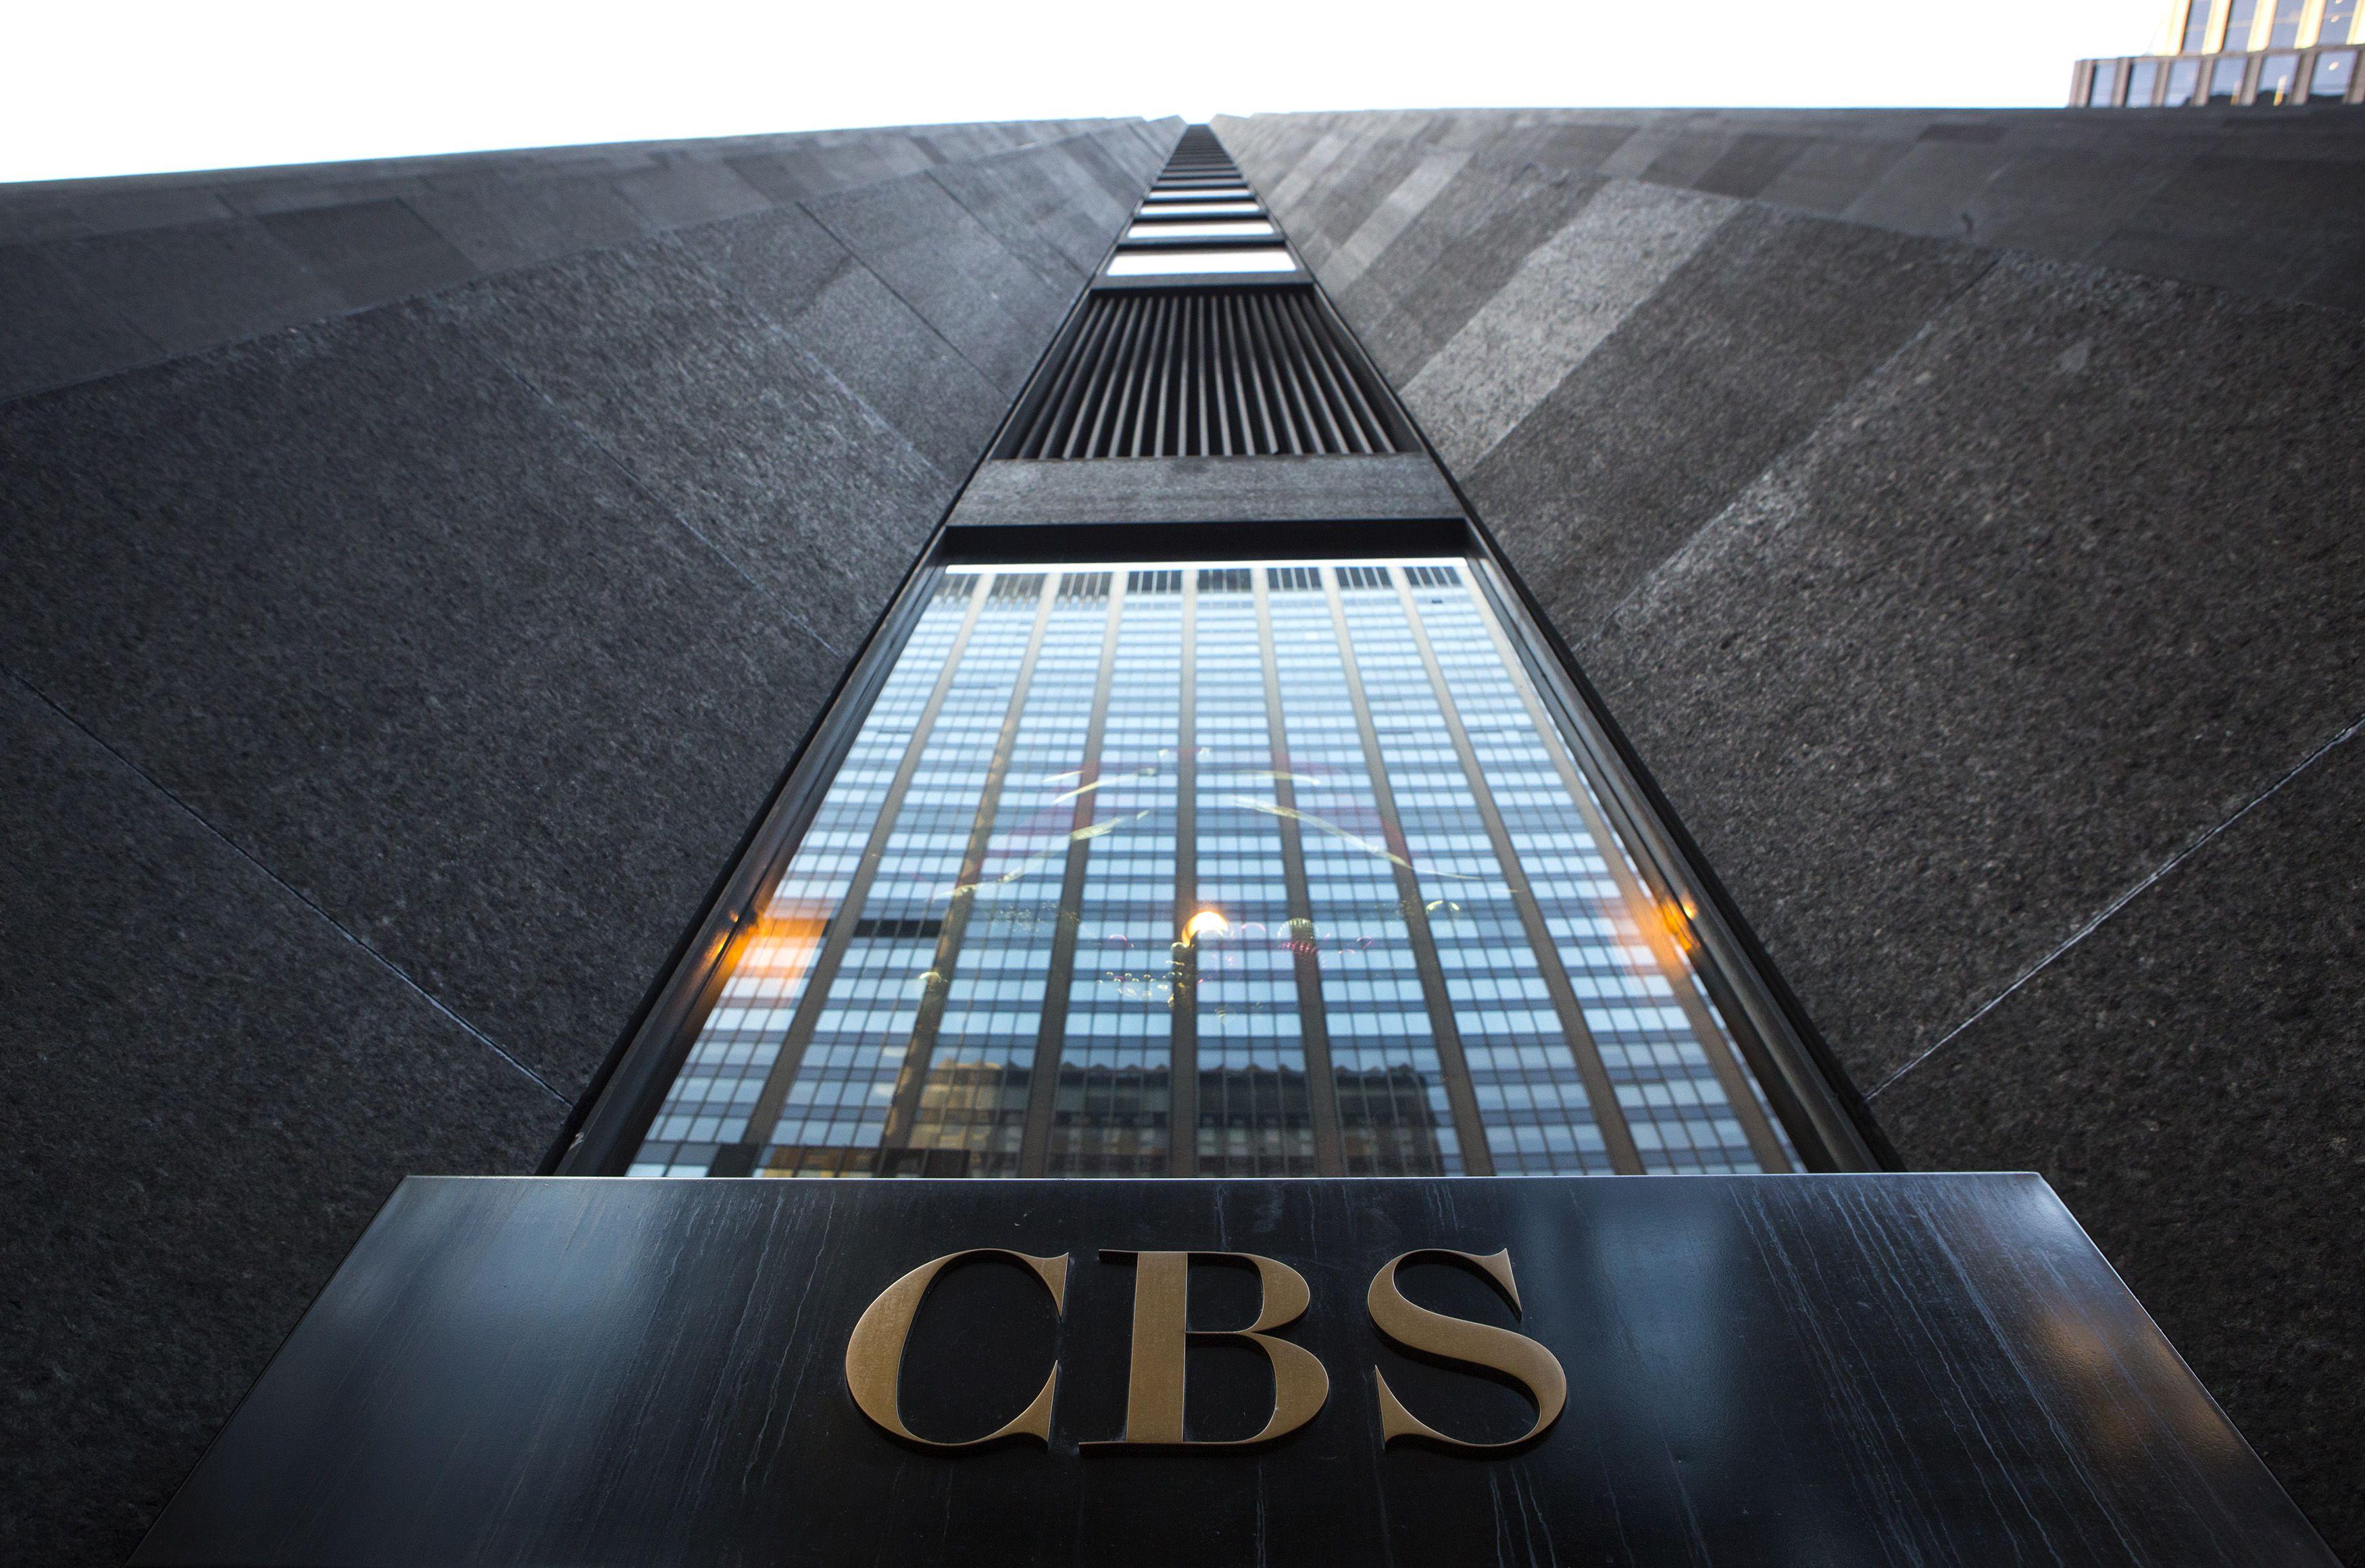 CBS HBO internet TV